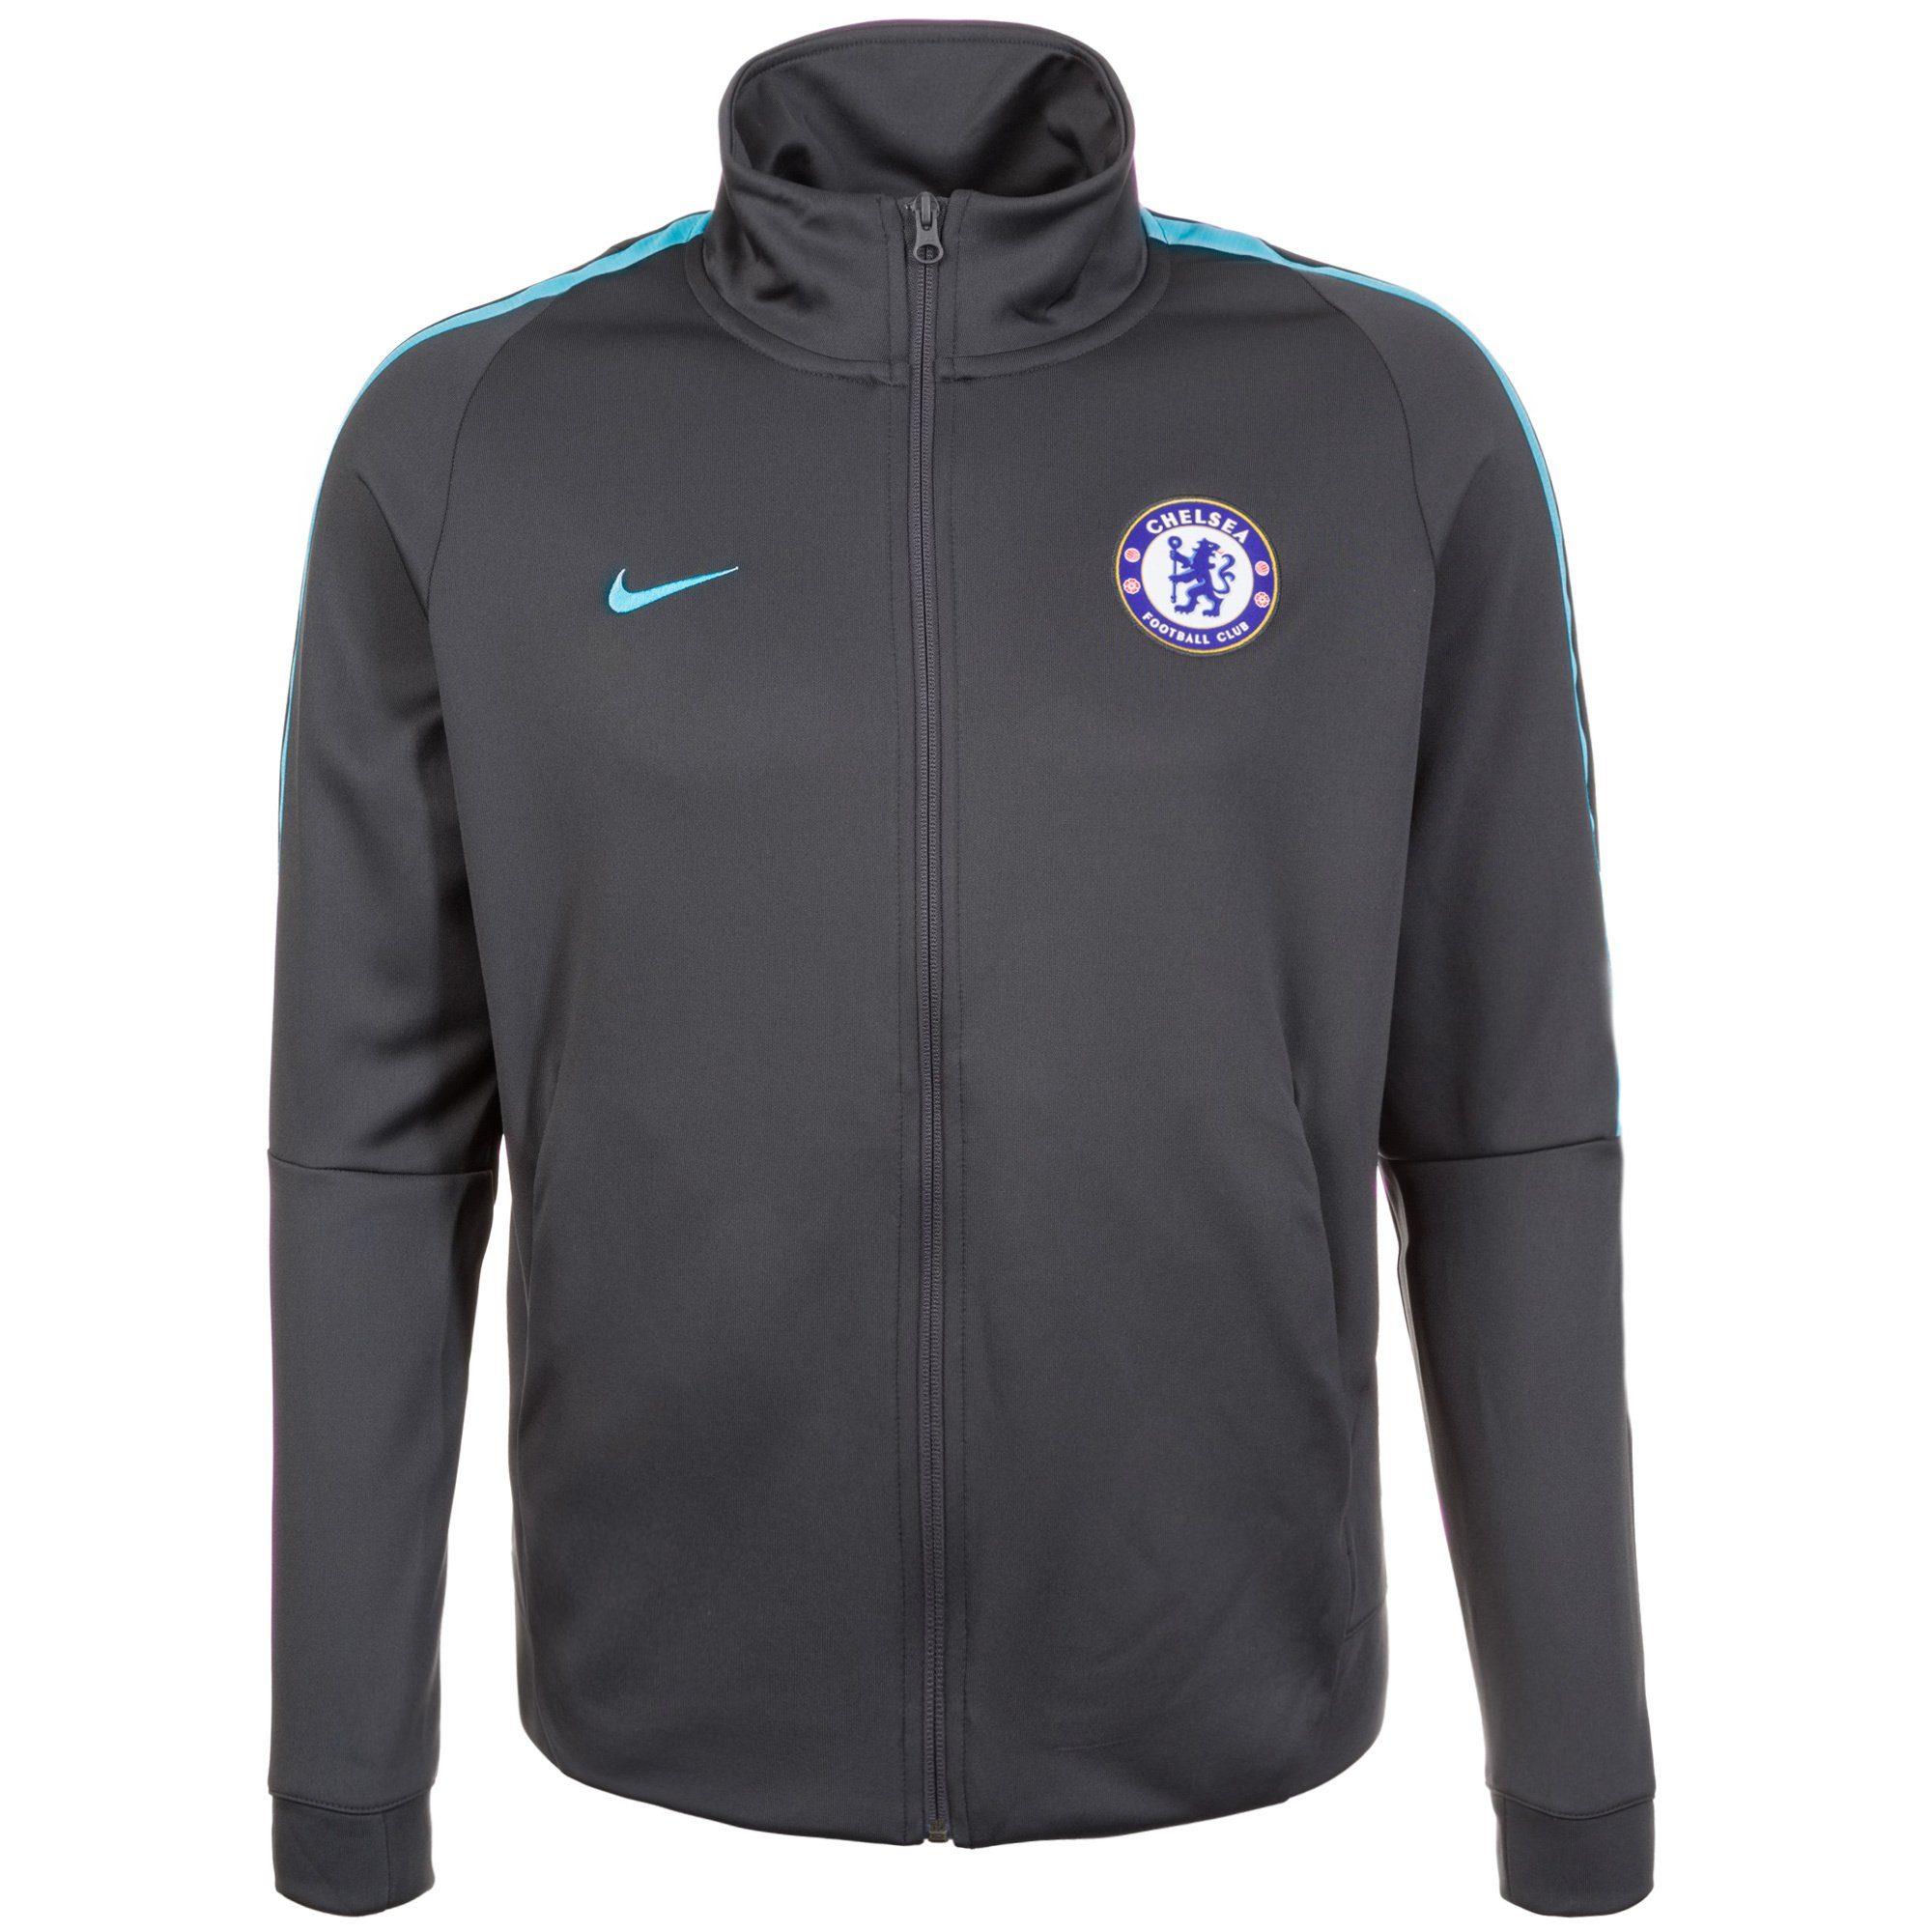 Nike Trainingsjacke Fc Chelsea Franchise   Sportbekleidung > Sportjacken > Trainingsjacken   Schwarz   Nike